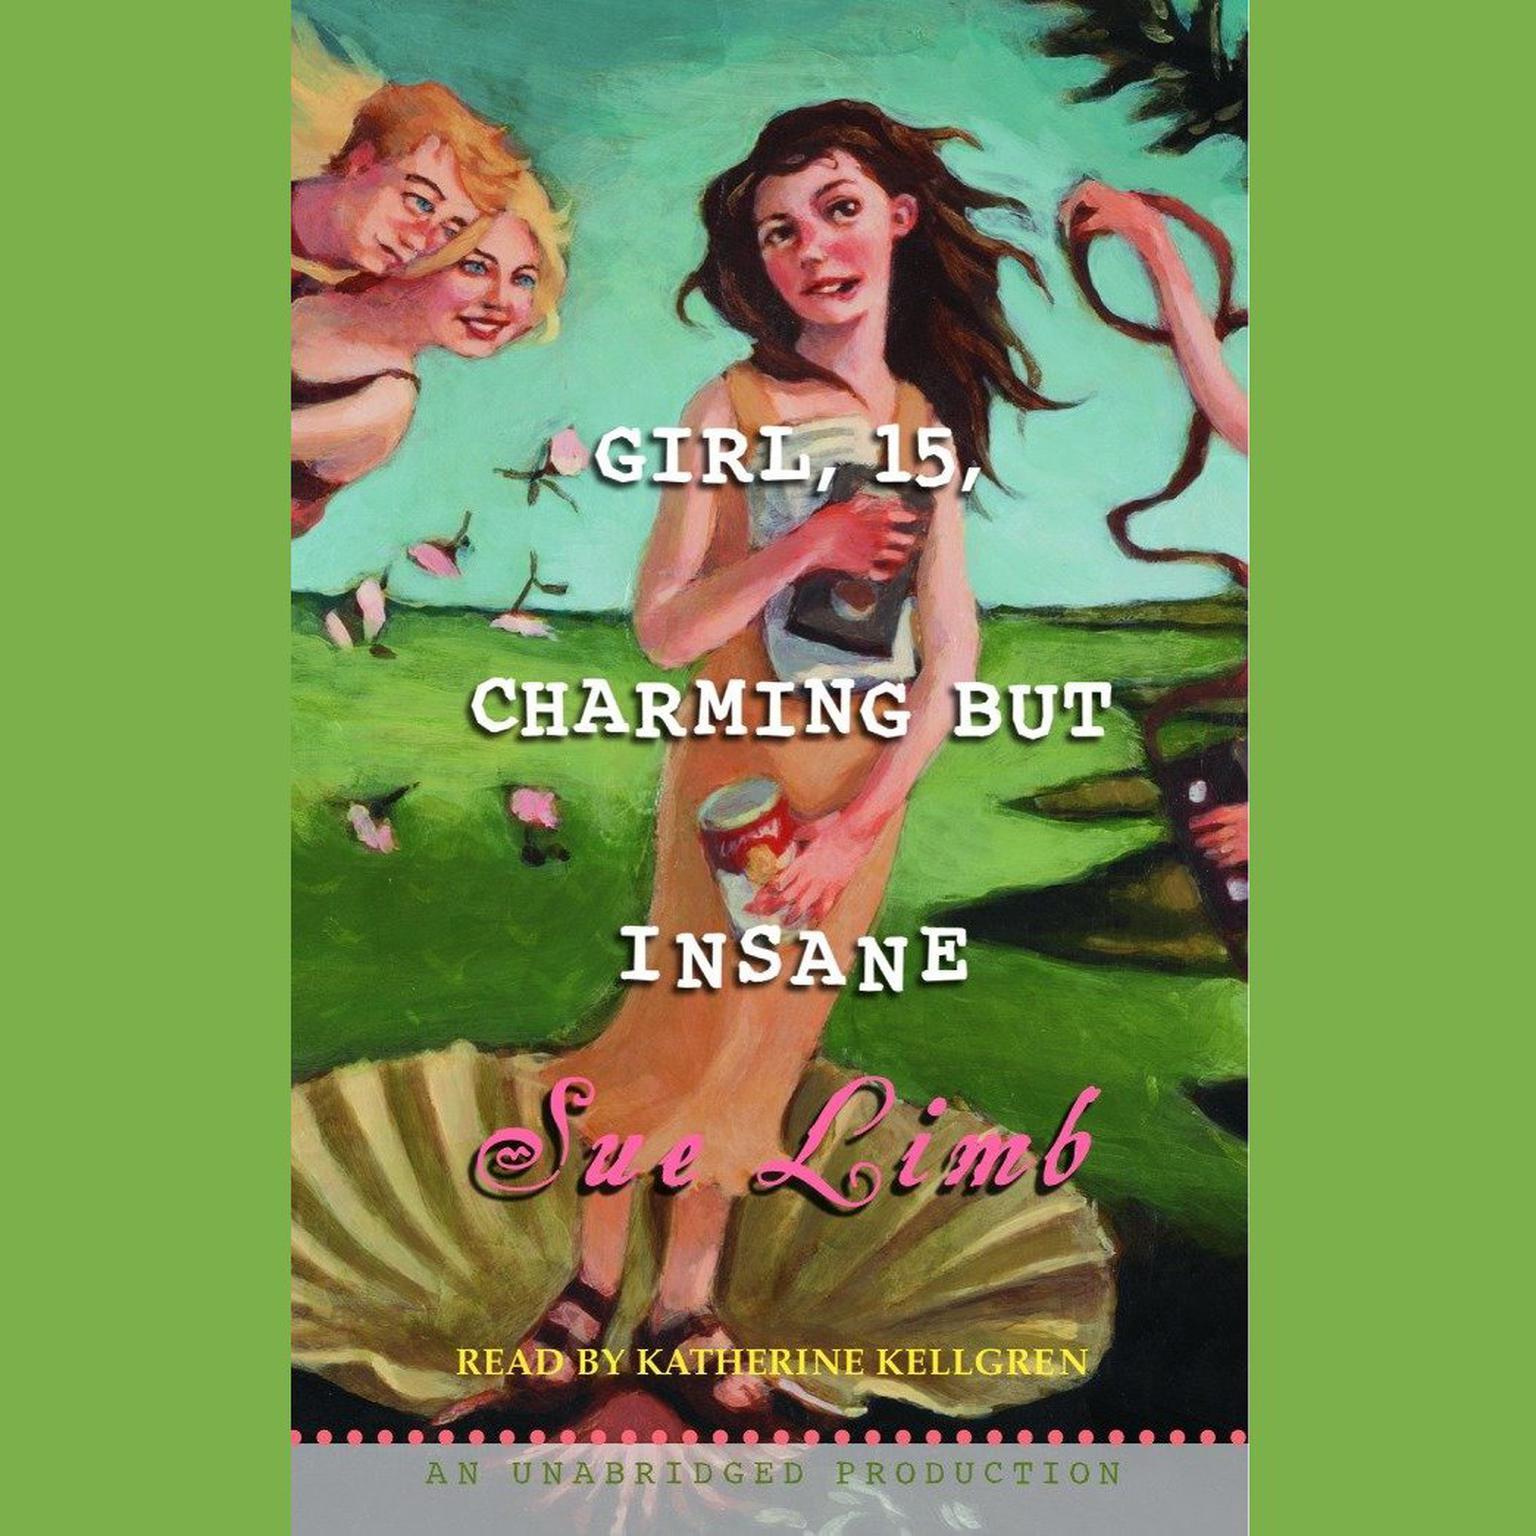 Printable Girl, 15, Charming but Insane Audiobook Cover Art